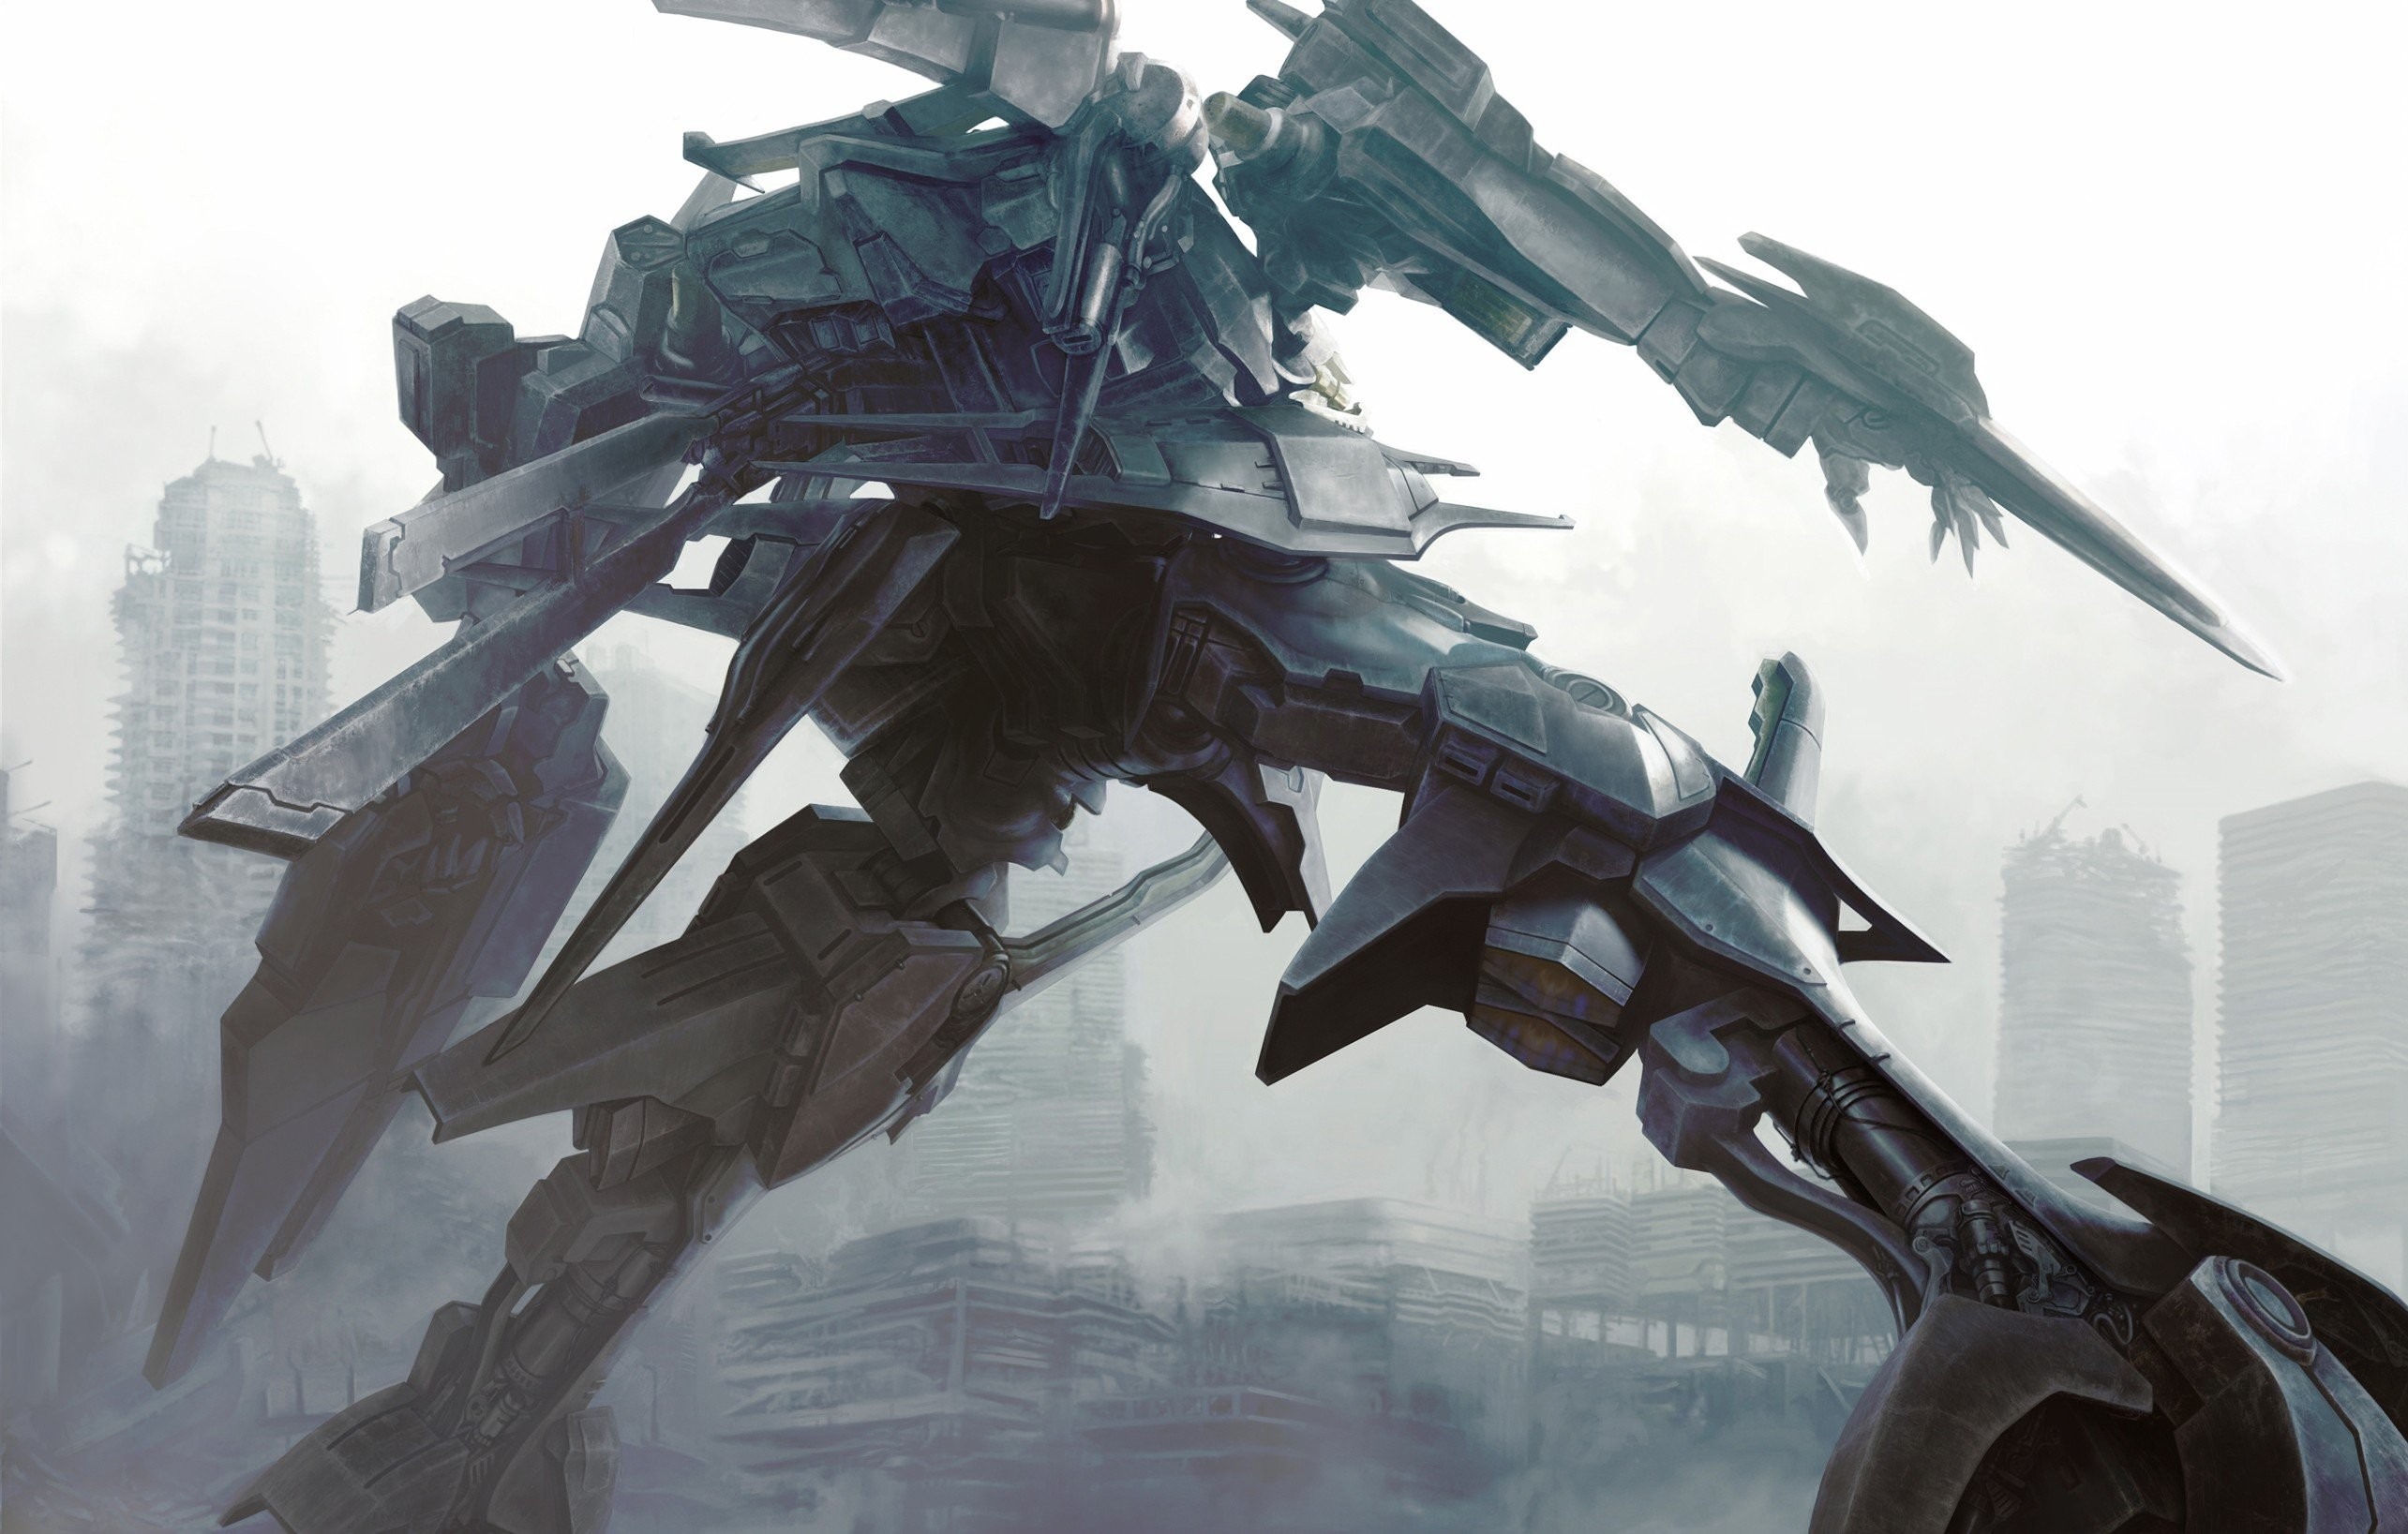 Anime Armored Core Artwork Fantasy Art Mecha Robots